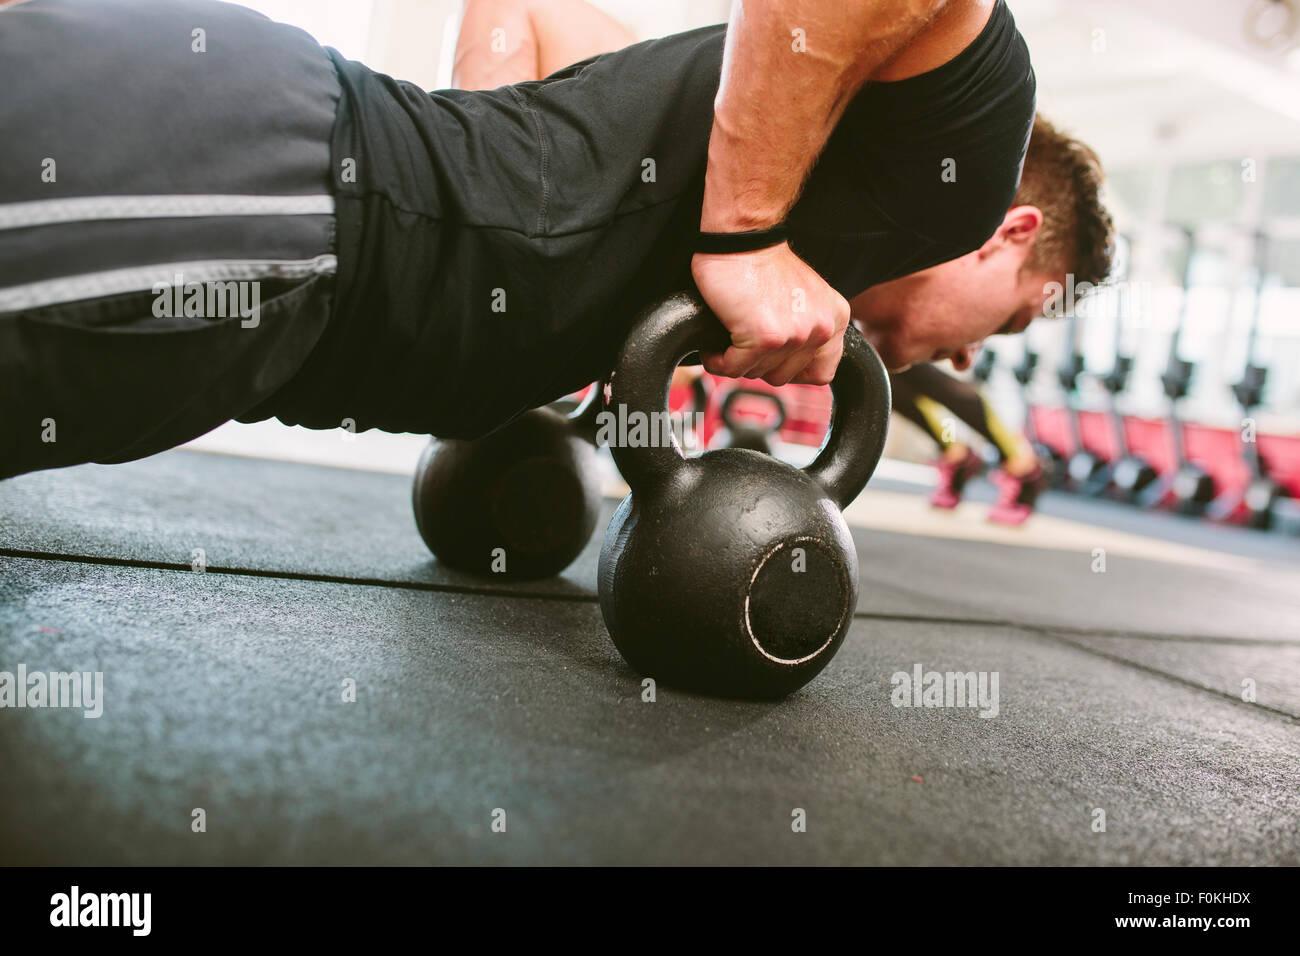 CrossFit Athlet macht Liegestütze auf kettlebells Stockbild